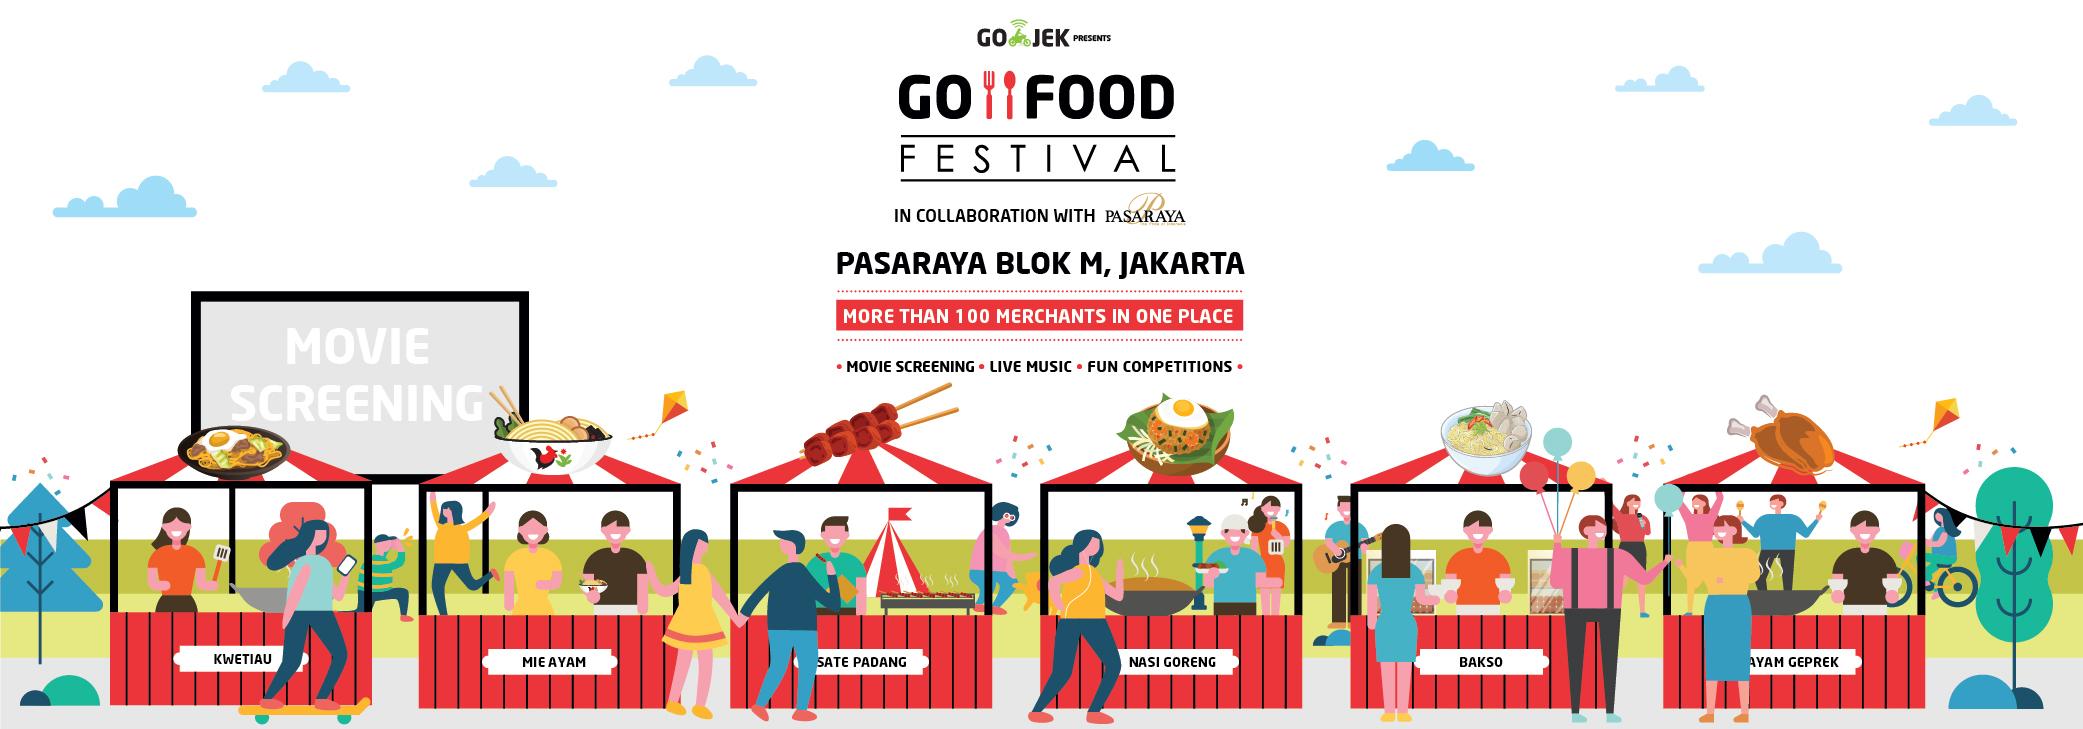 GO-FOOD FESTIVAL 2018 Hadir Kembali